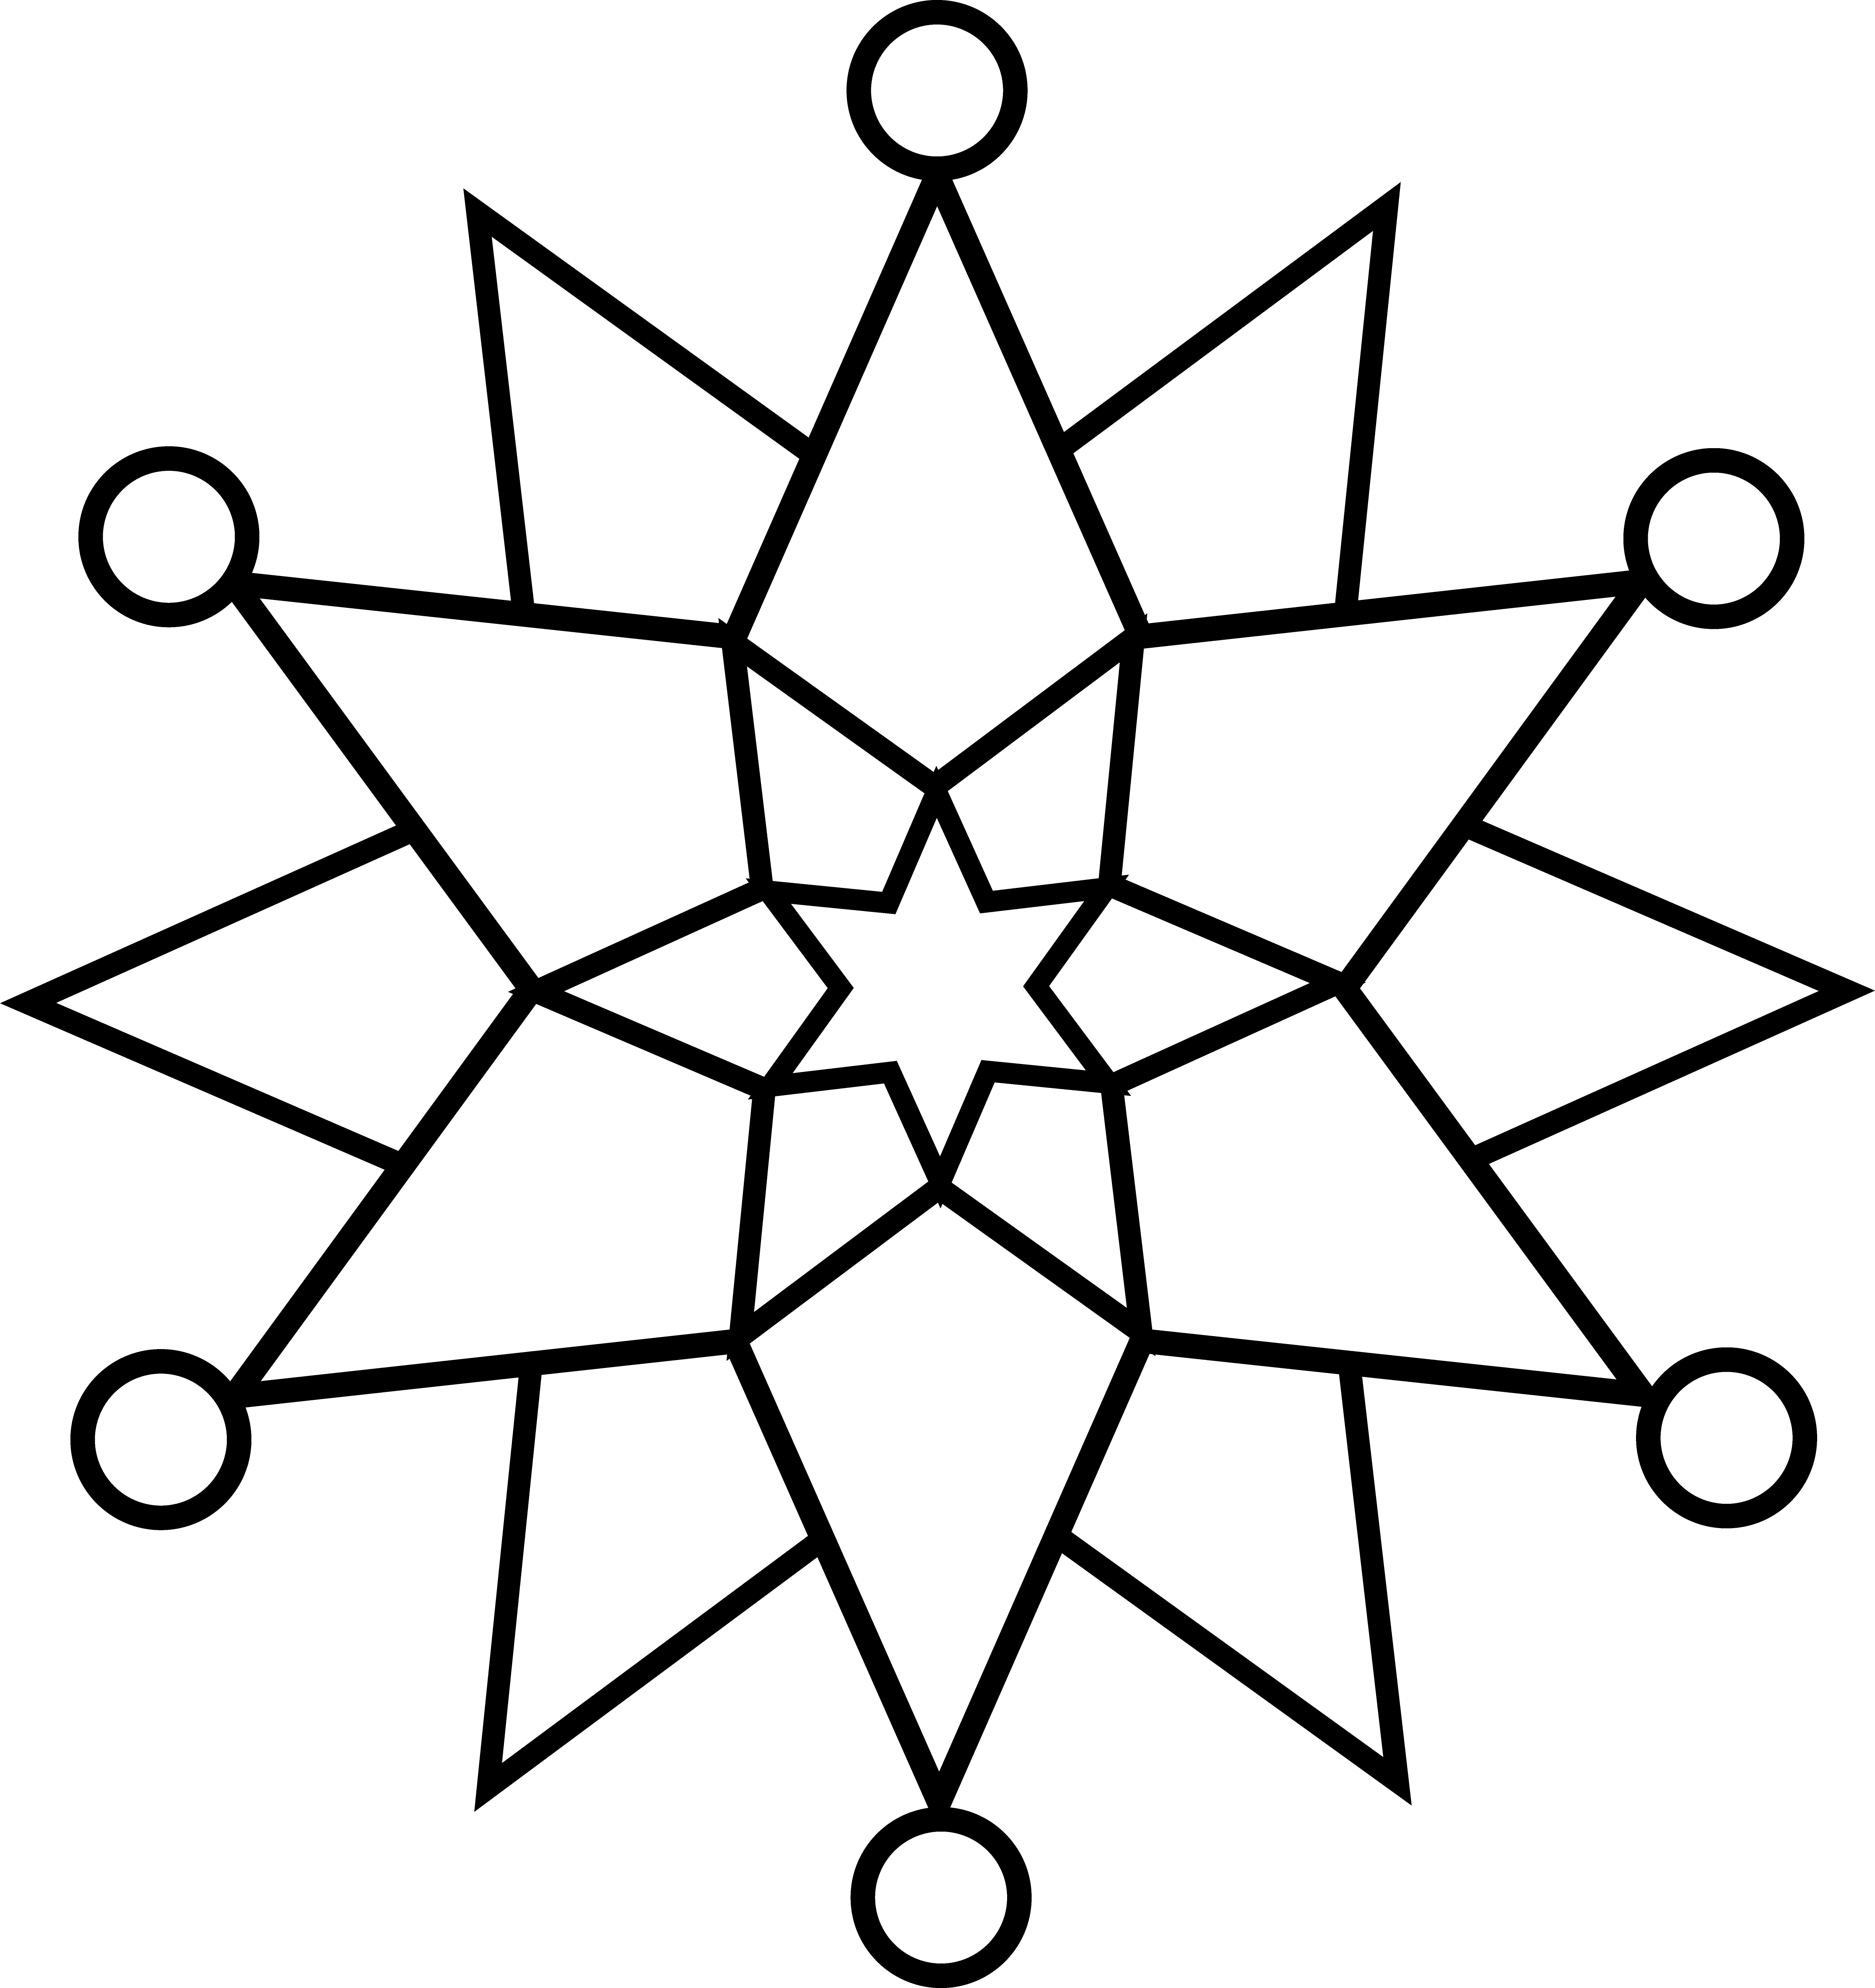 Snowman  black and white black and white snowflake clip art